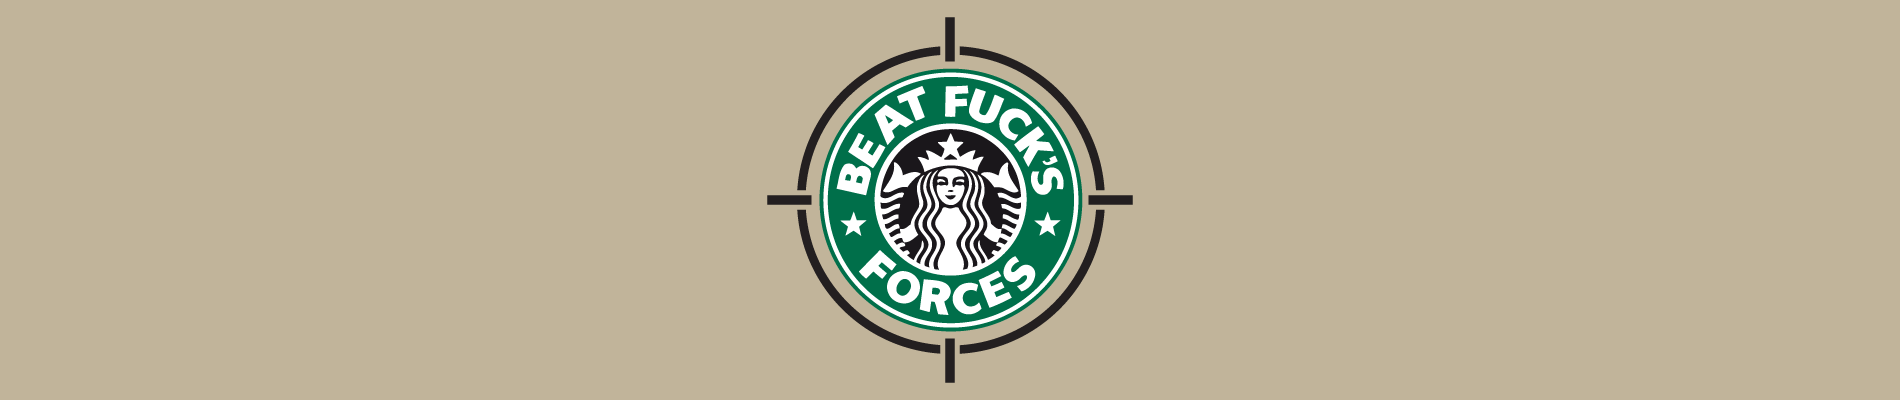 Starbucks Genocide